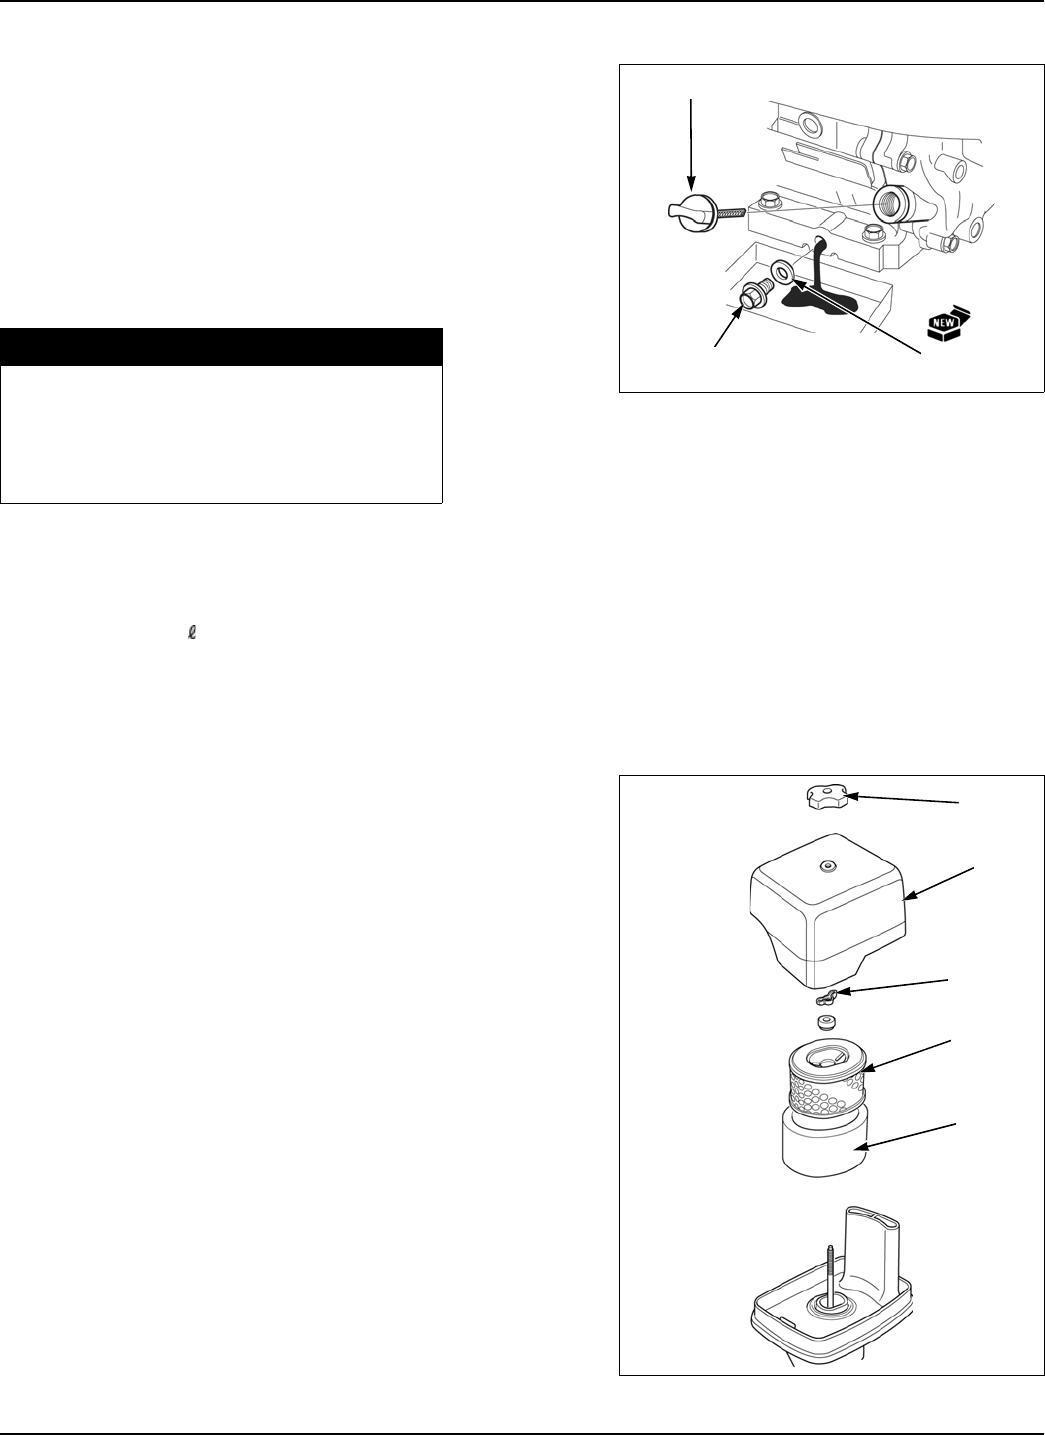 Honda Gx240 Gx270 Gx340 Gx390 Ut2 Rt2 Technical Manual Download Gx 390 Wiring Diagram Page 44